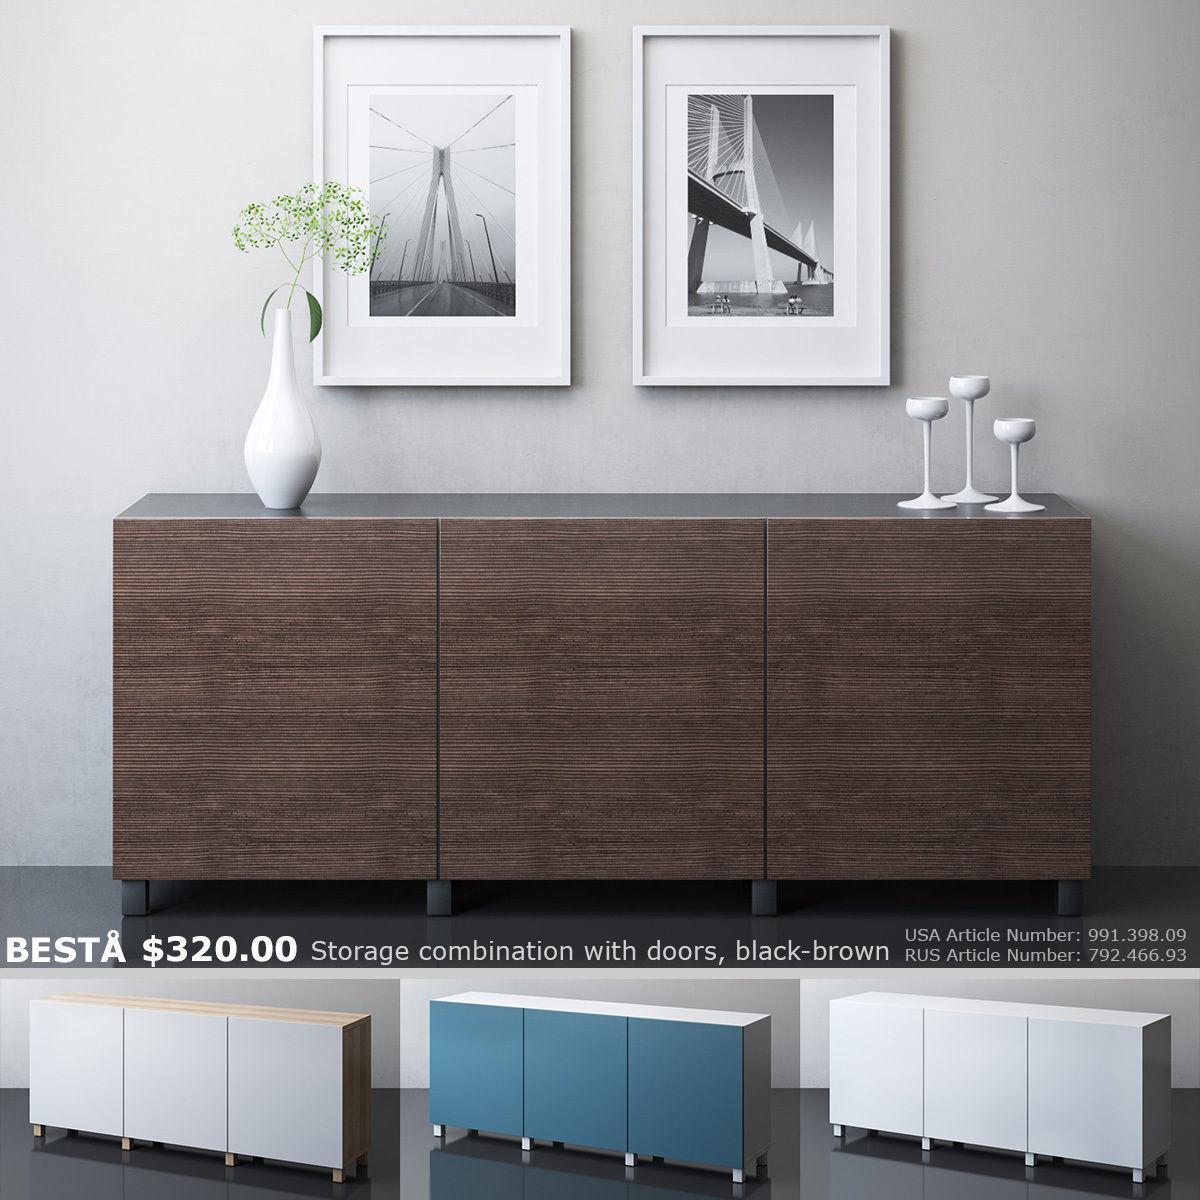 BESTA Storage combination with doors collection